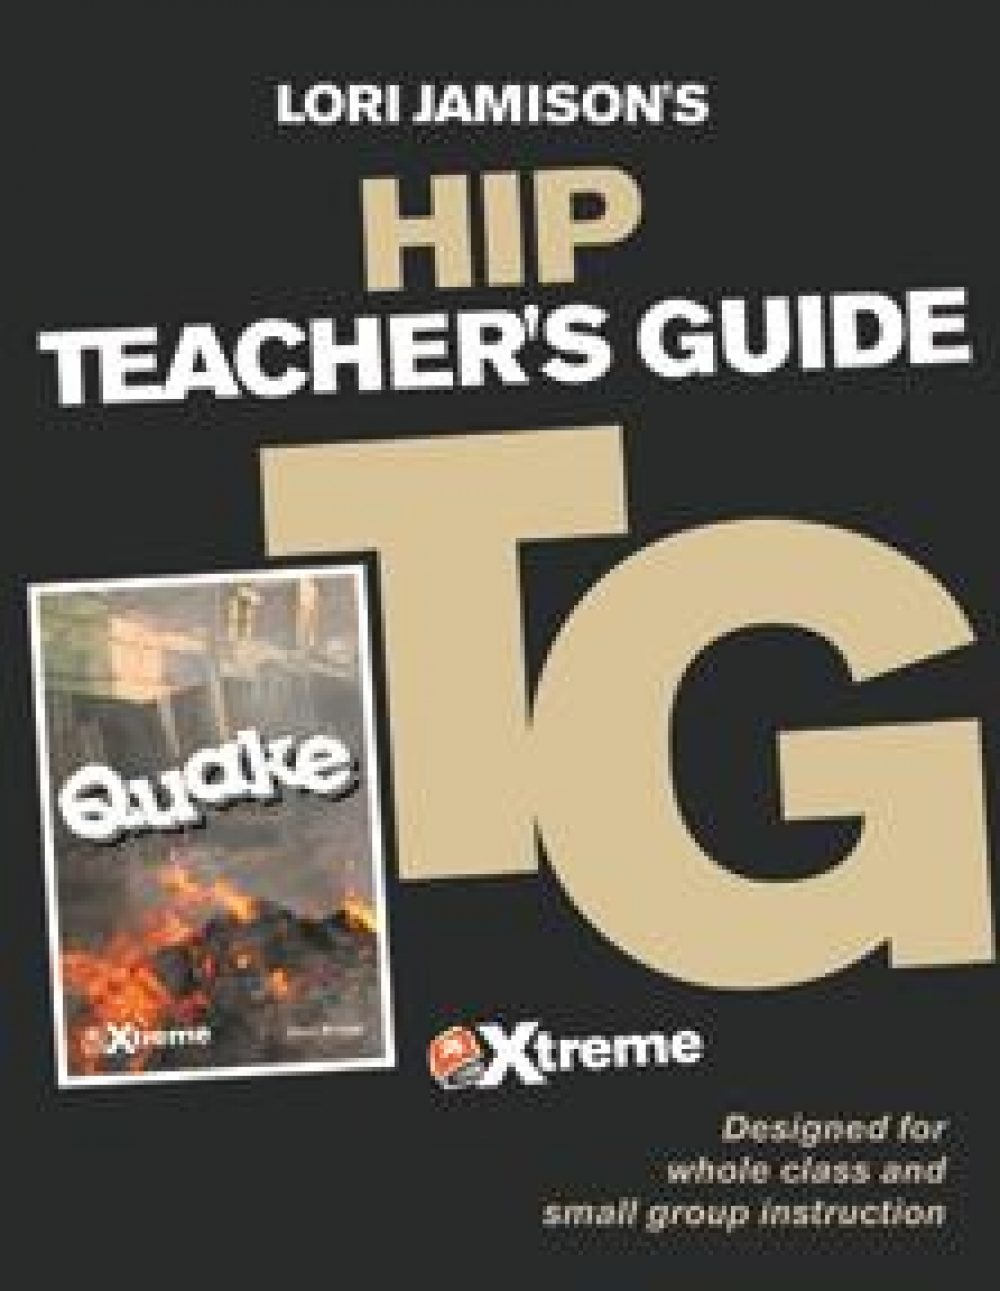 Quake - Teacher's Guide